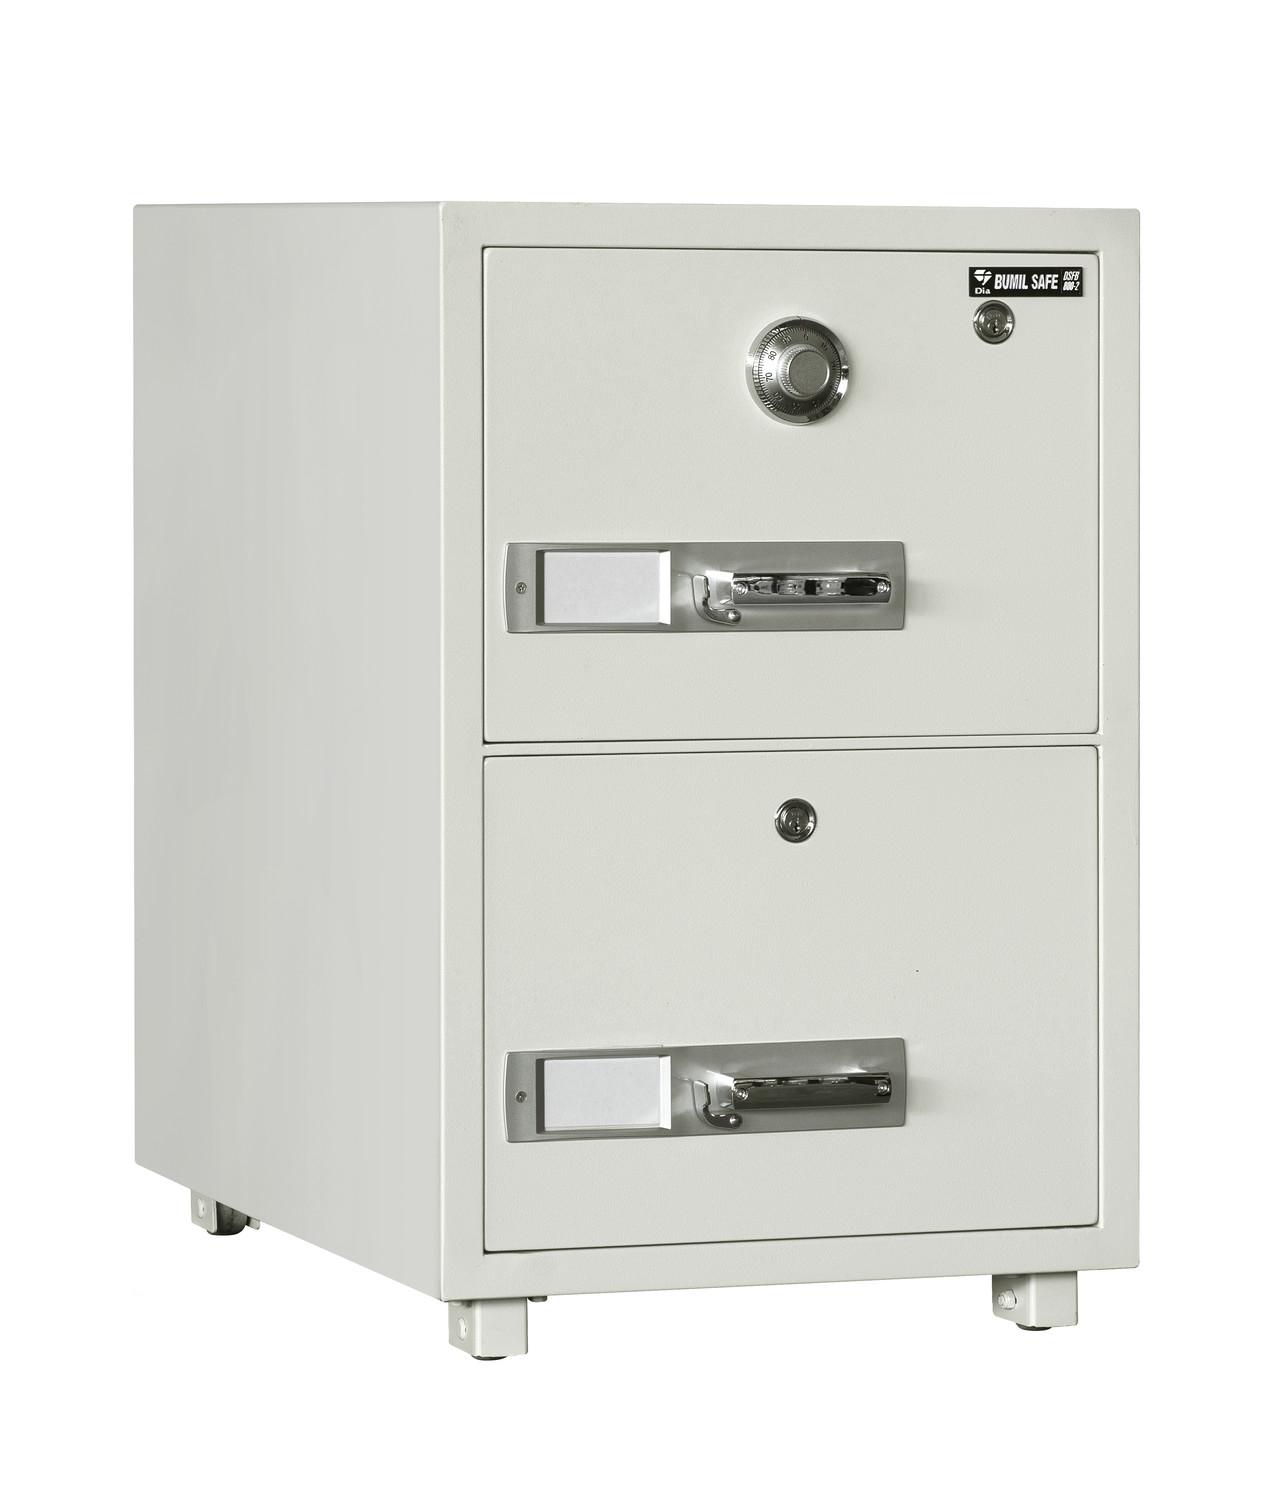 DSF680-2